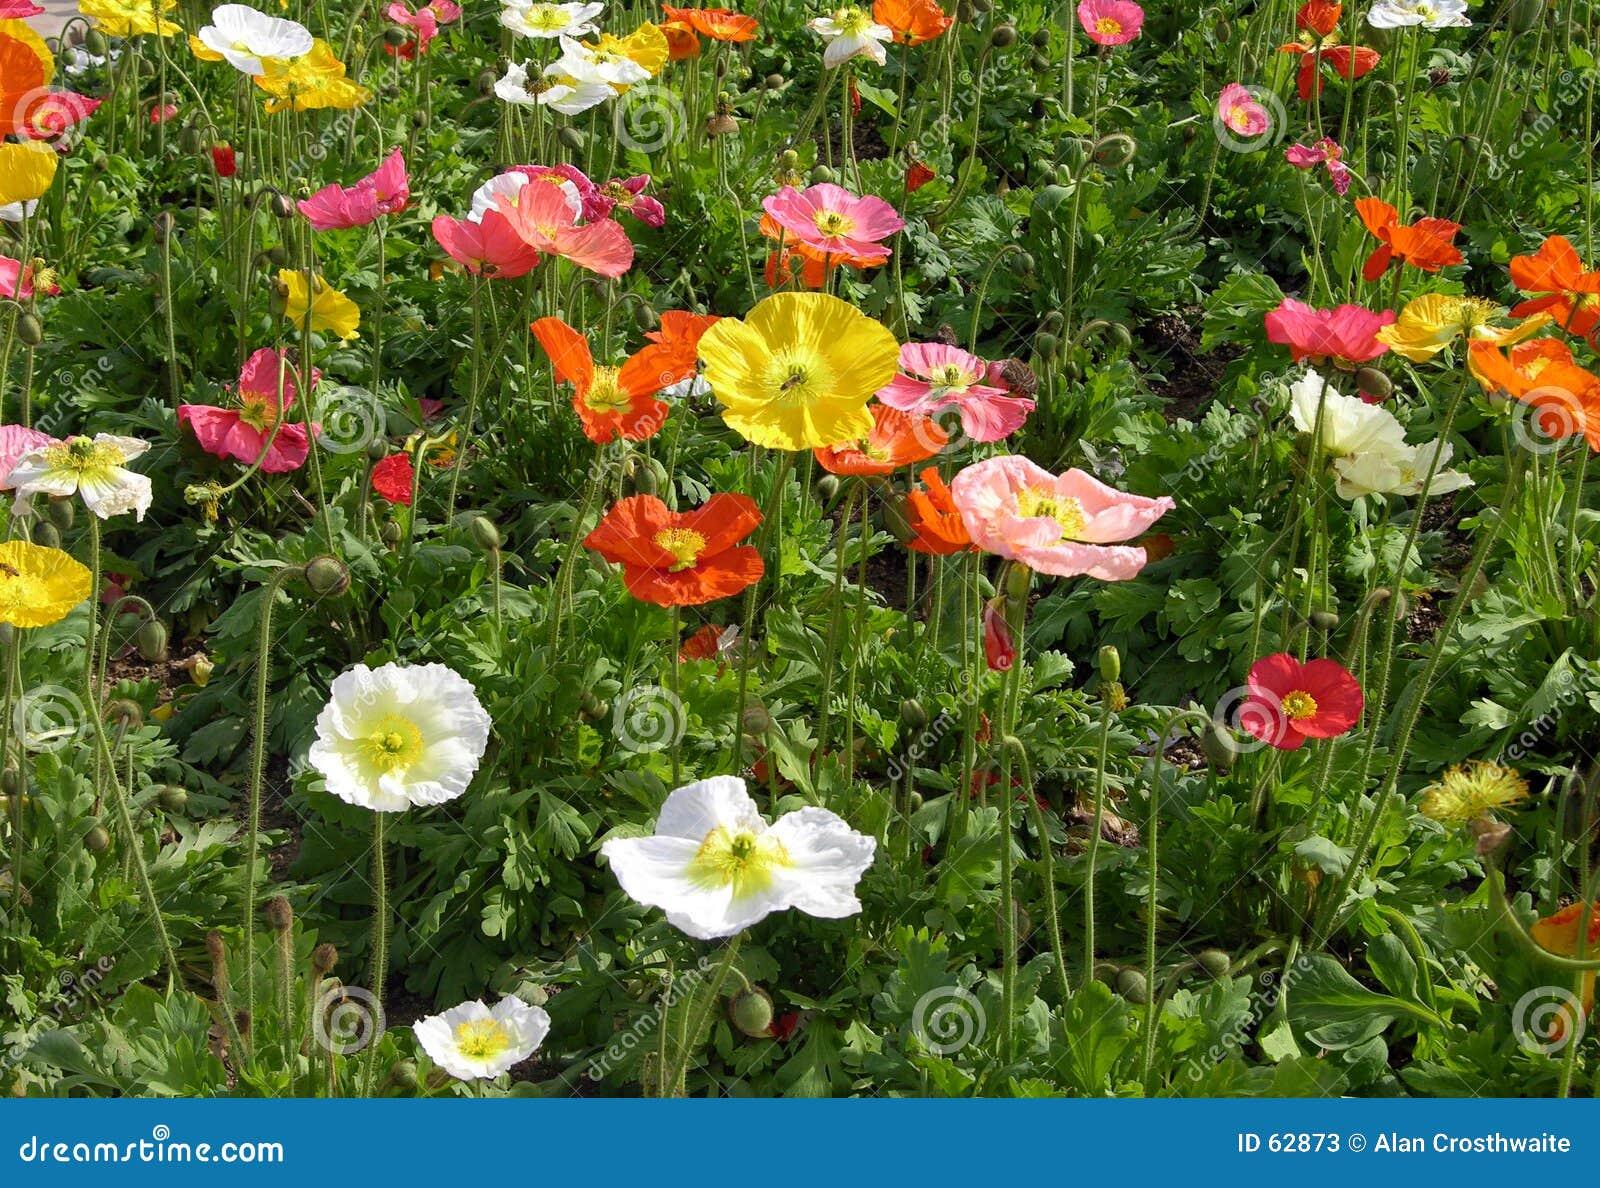 Download Wildflowers άνοιξη στοκ εικόνα. εικόνα από λουλούδι, άνοιξη - 62873